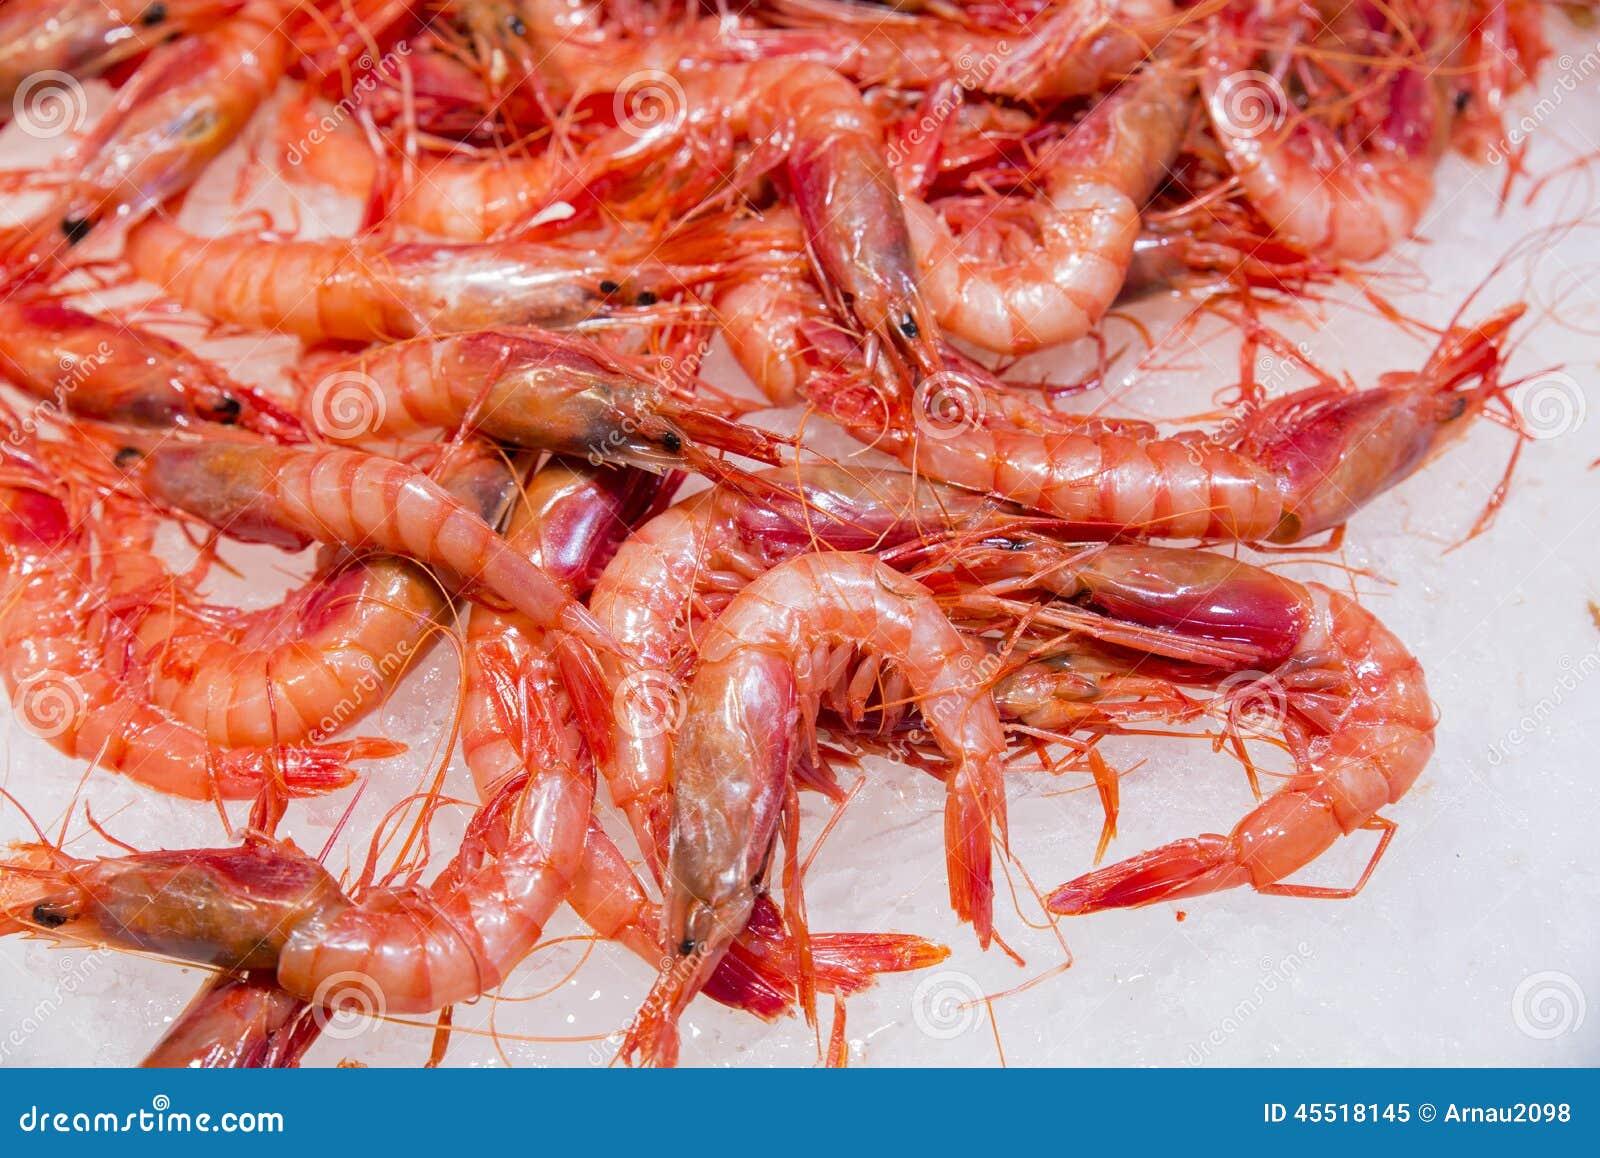 how to buy fresh prawns